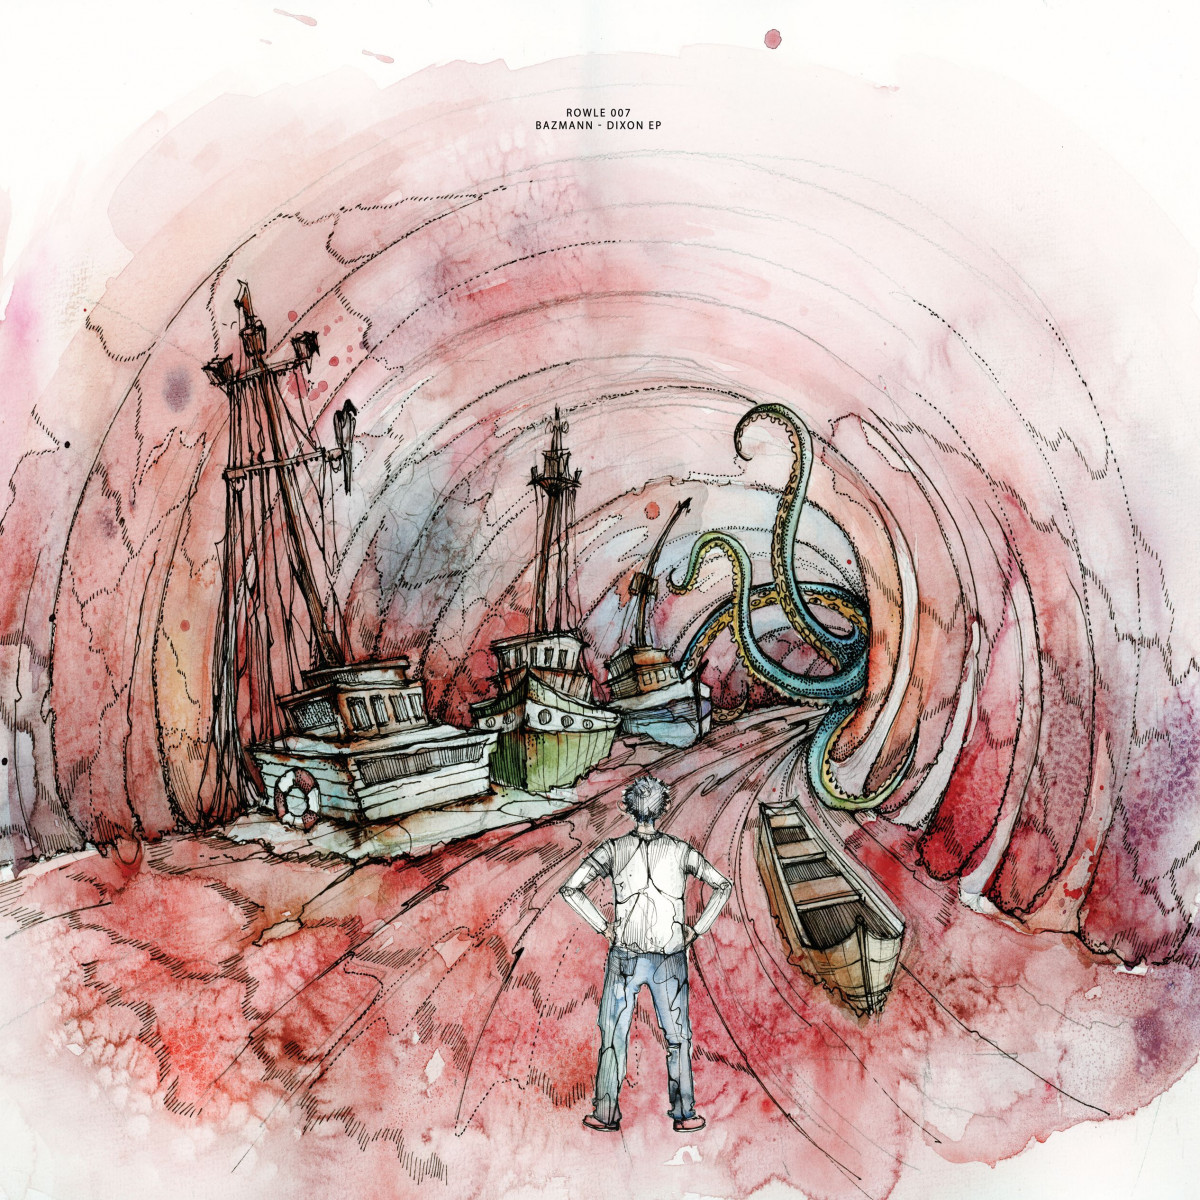 Bazmann (Nils Weimann & Stephan Bazbaz) - Dixon EP [Rowle] 01